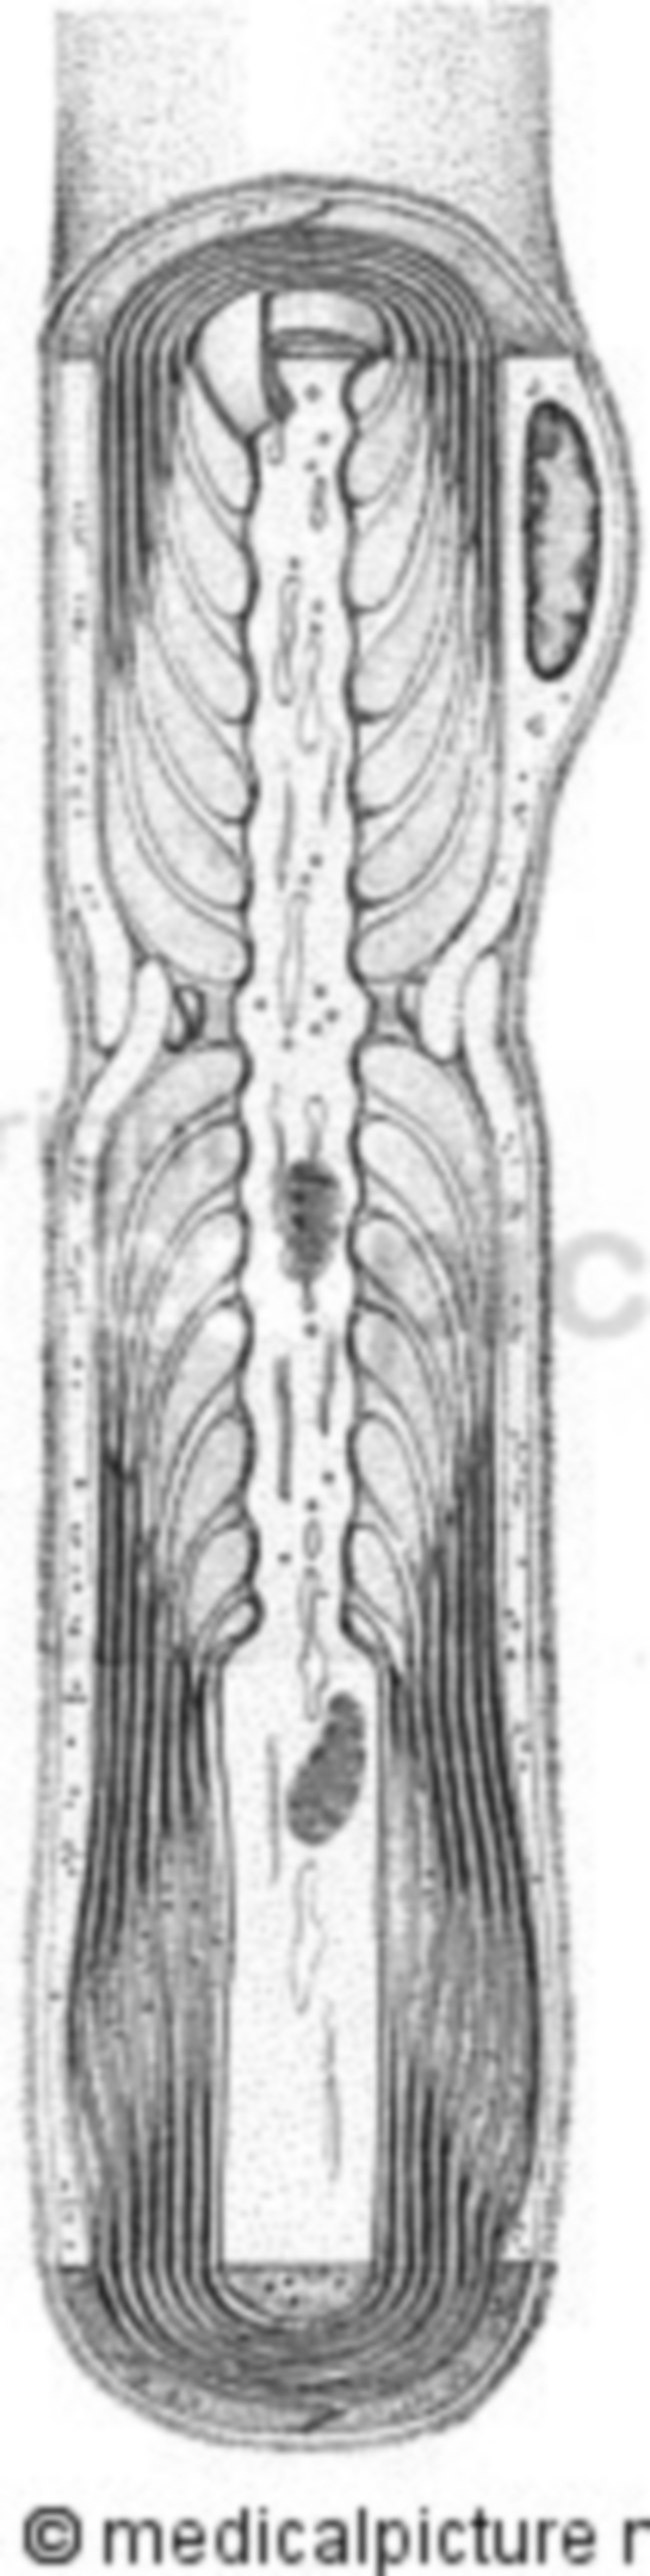 Nerve fibers with myelin sheaths